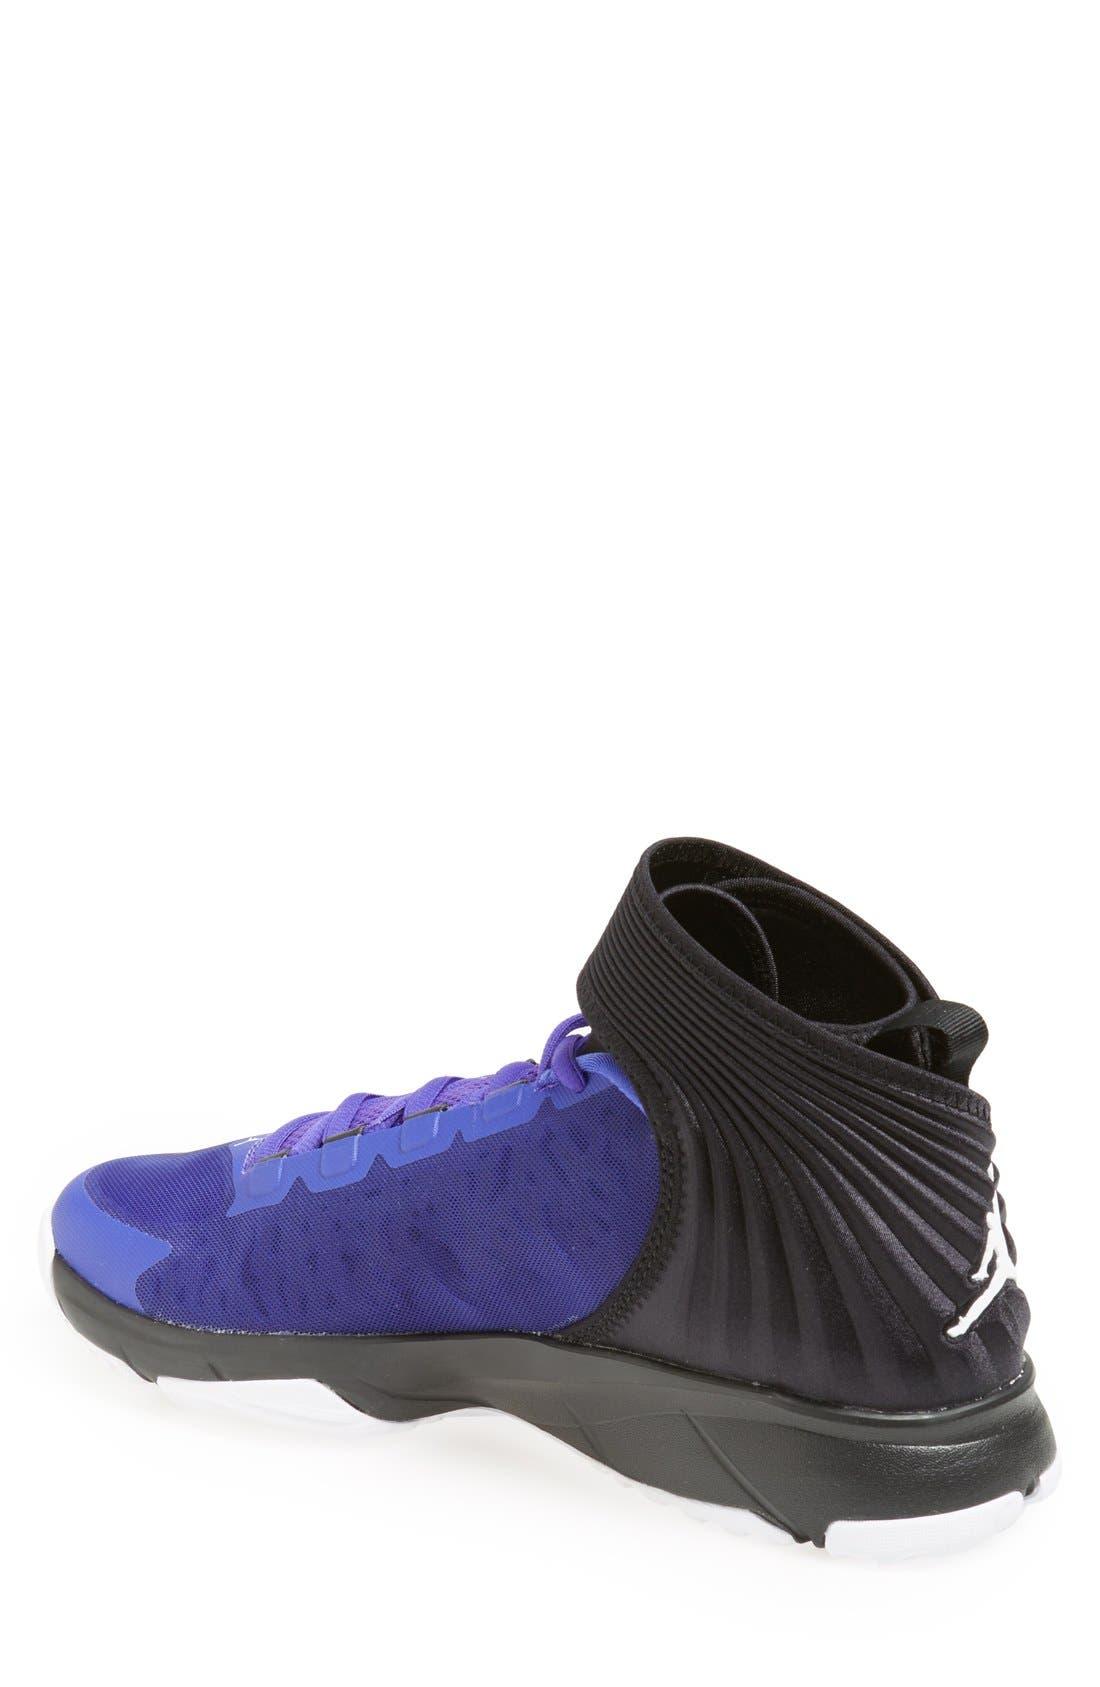 Alternate Image 2  - Nike 'Jordan Dominate Pro 2' Training Shoe (Men)